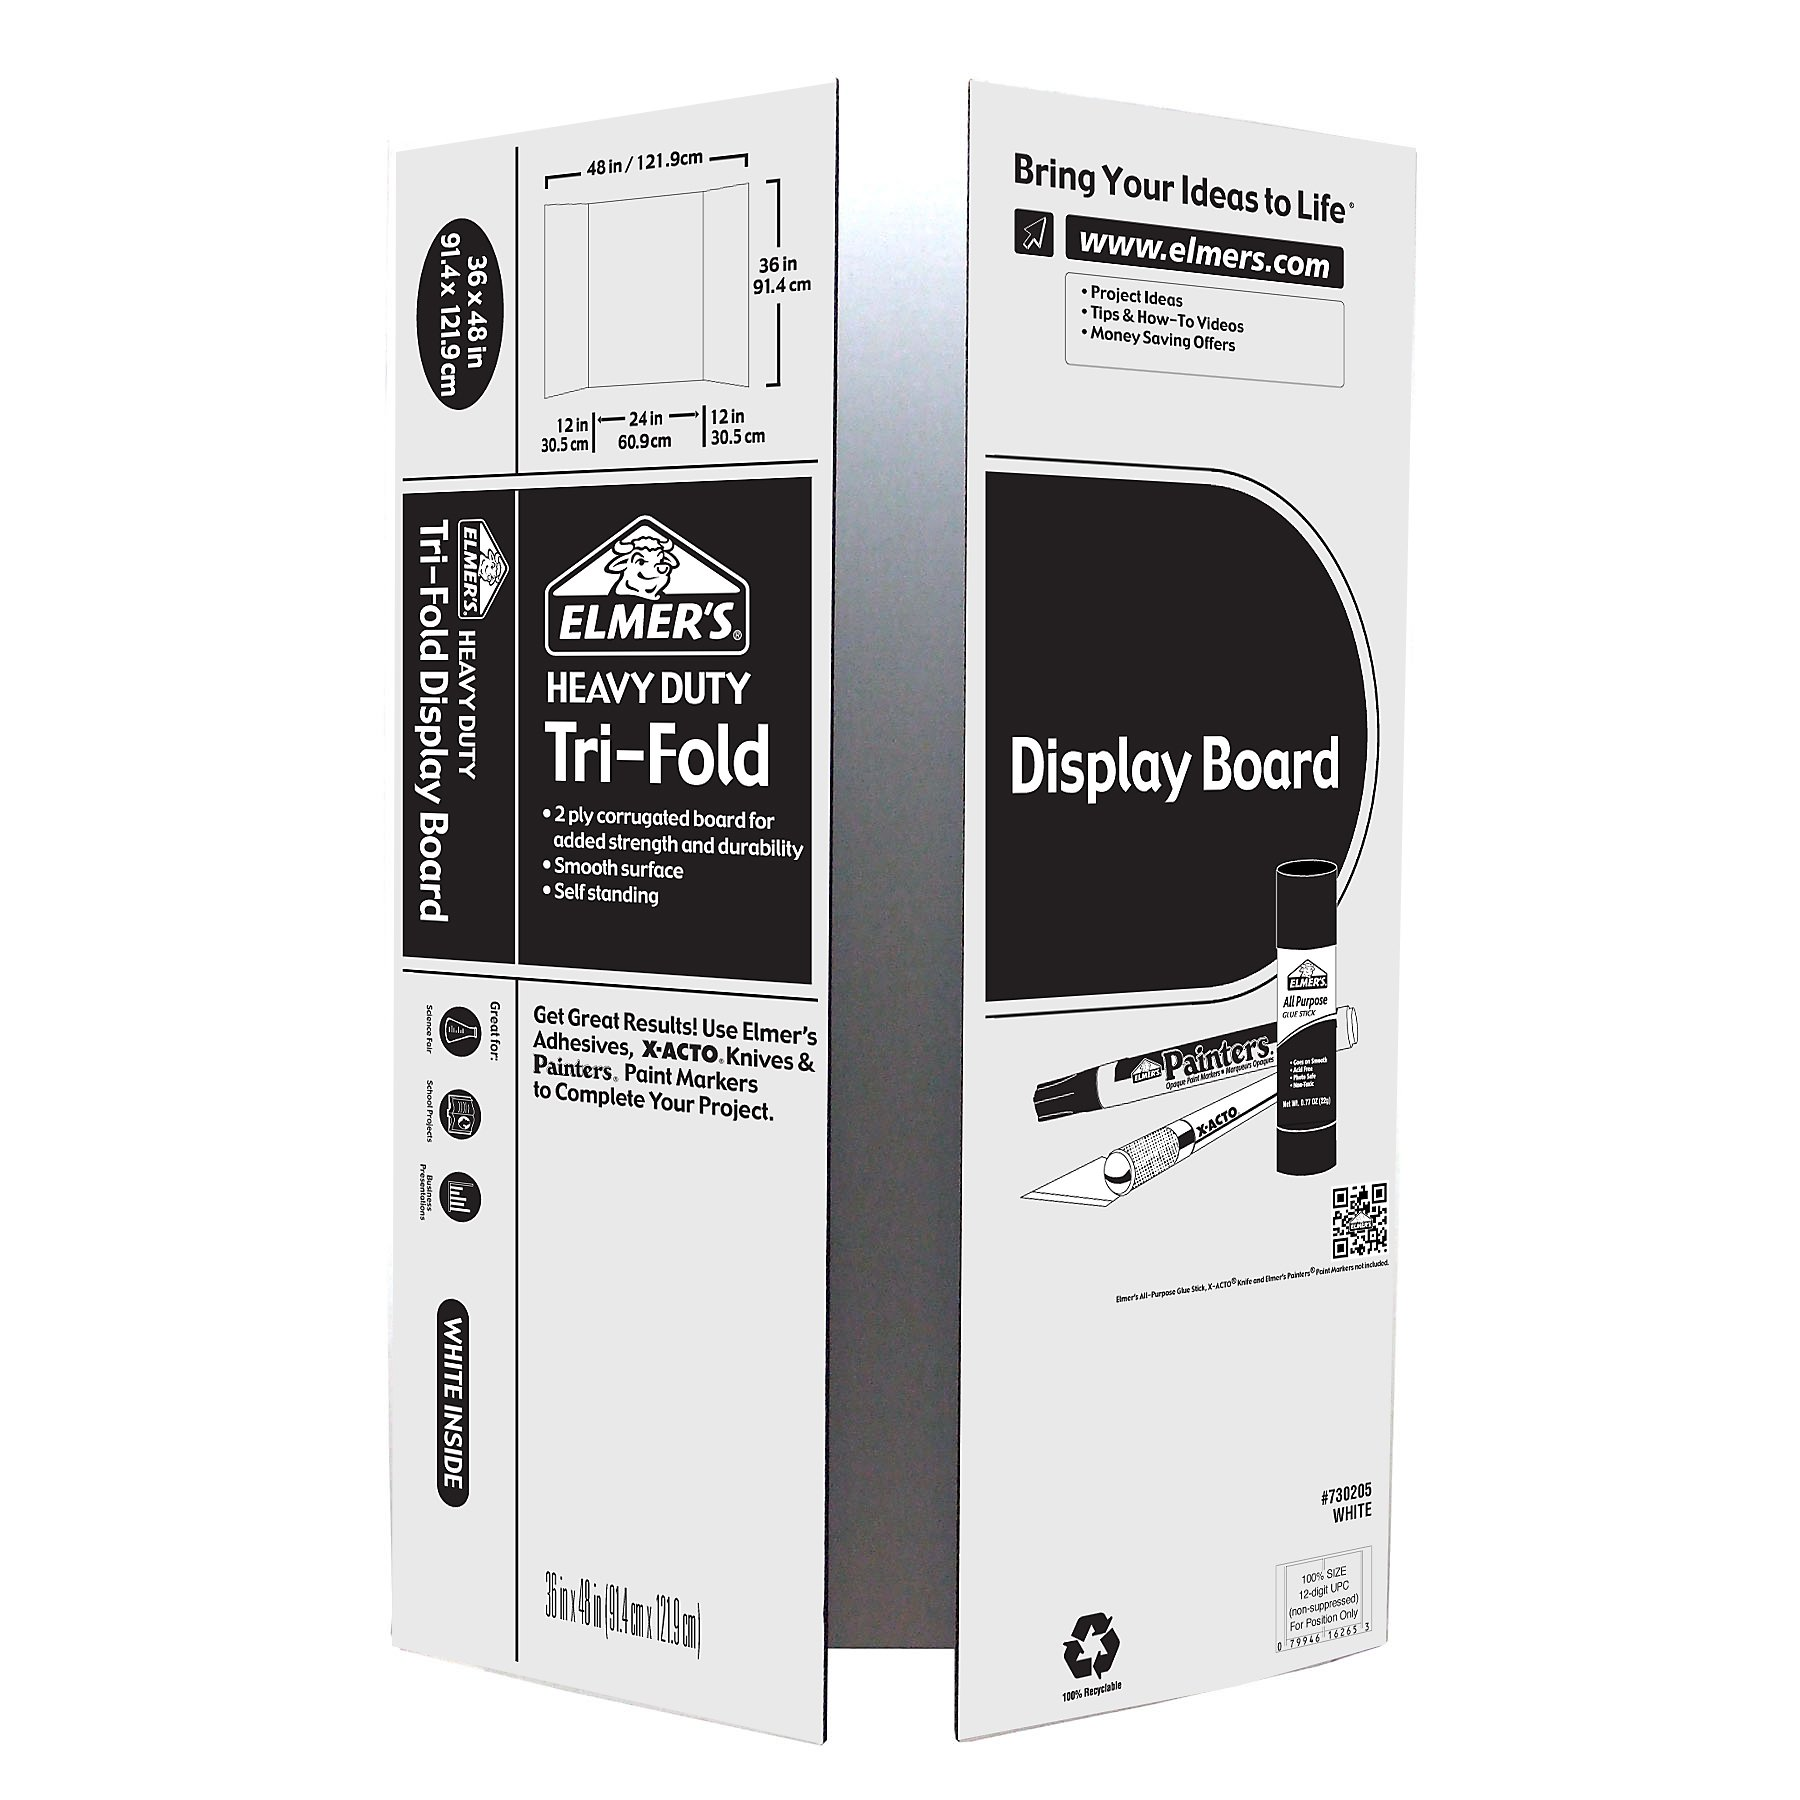 Elmer's Heavy Duty Tri-Fold Display Board, White, 36x48 Inch (Pack of 12)